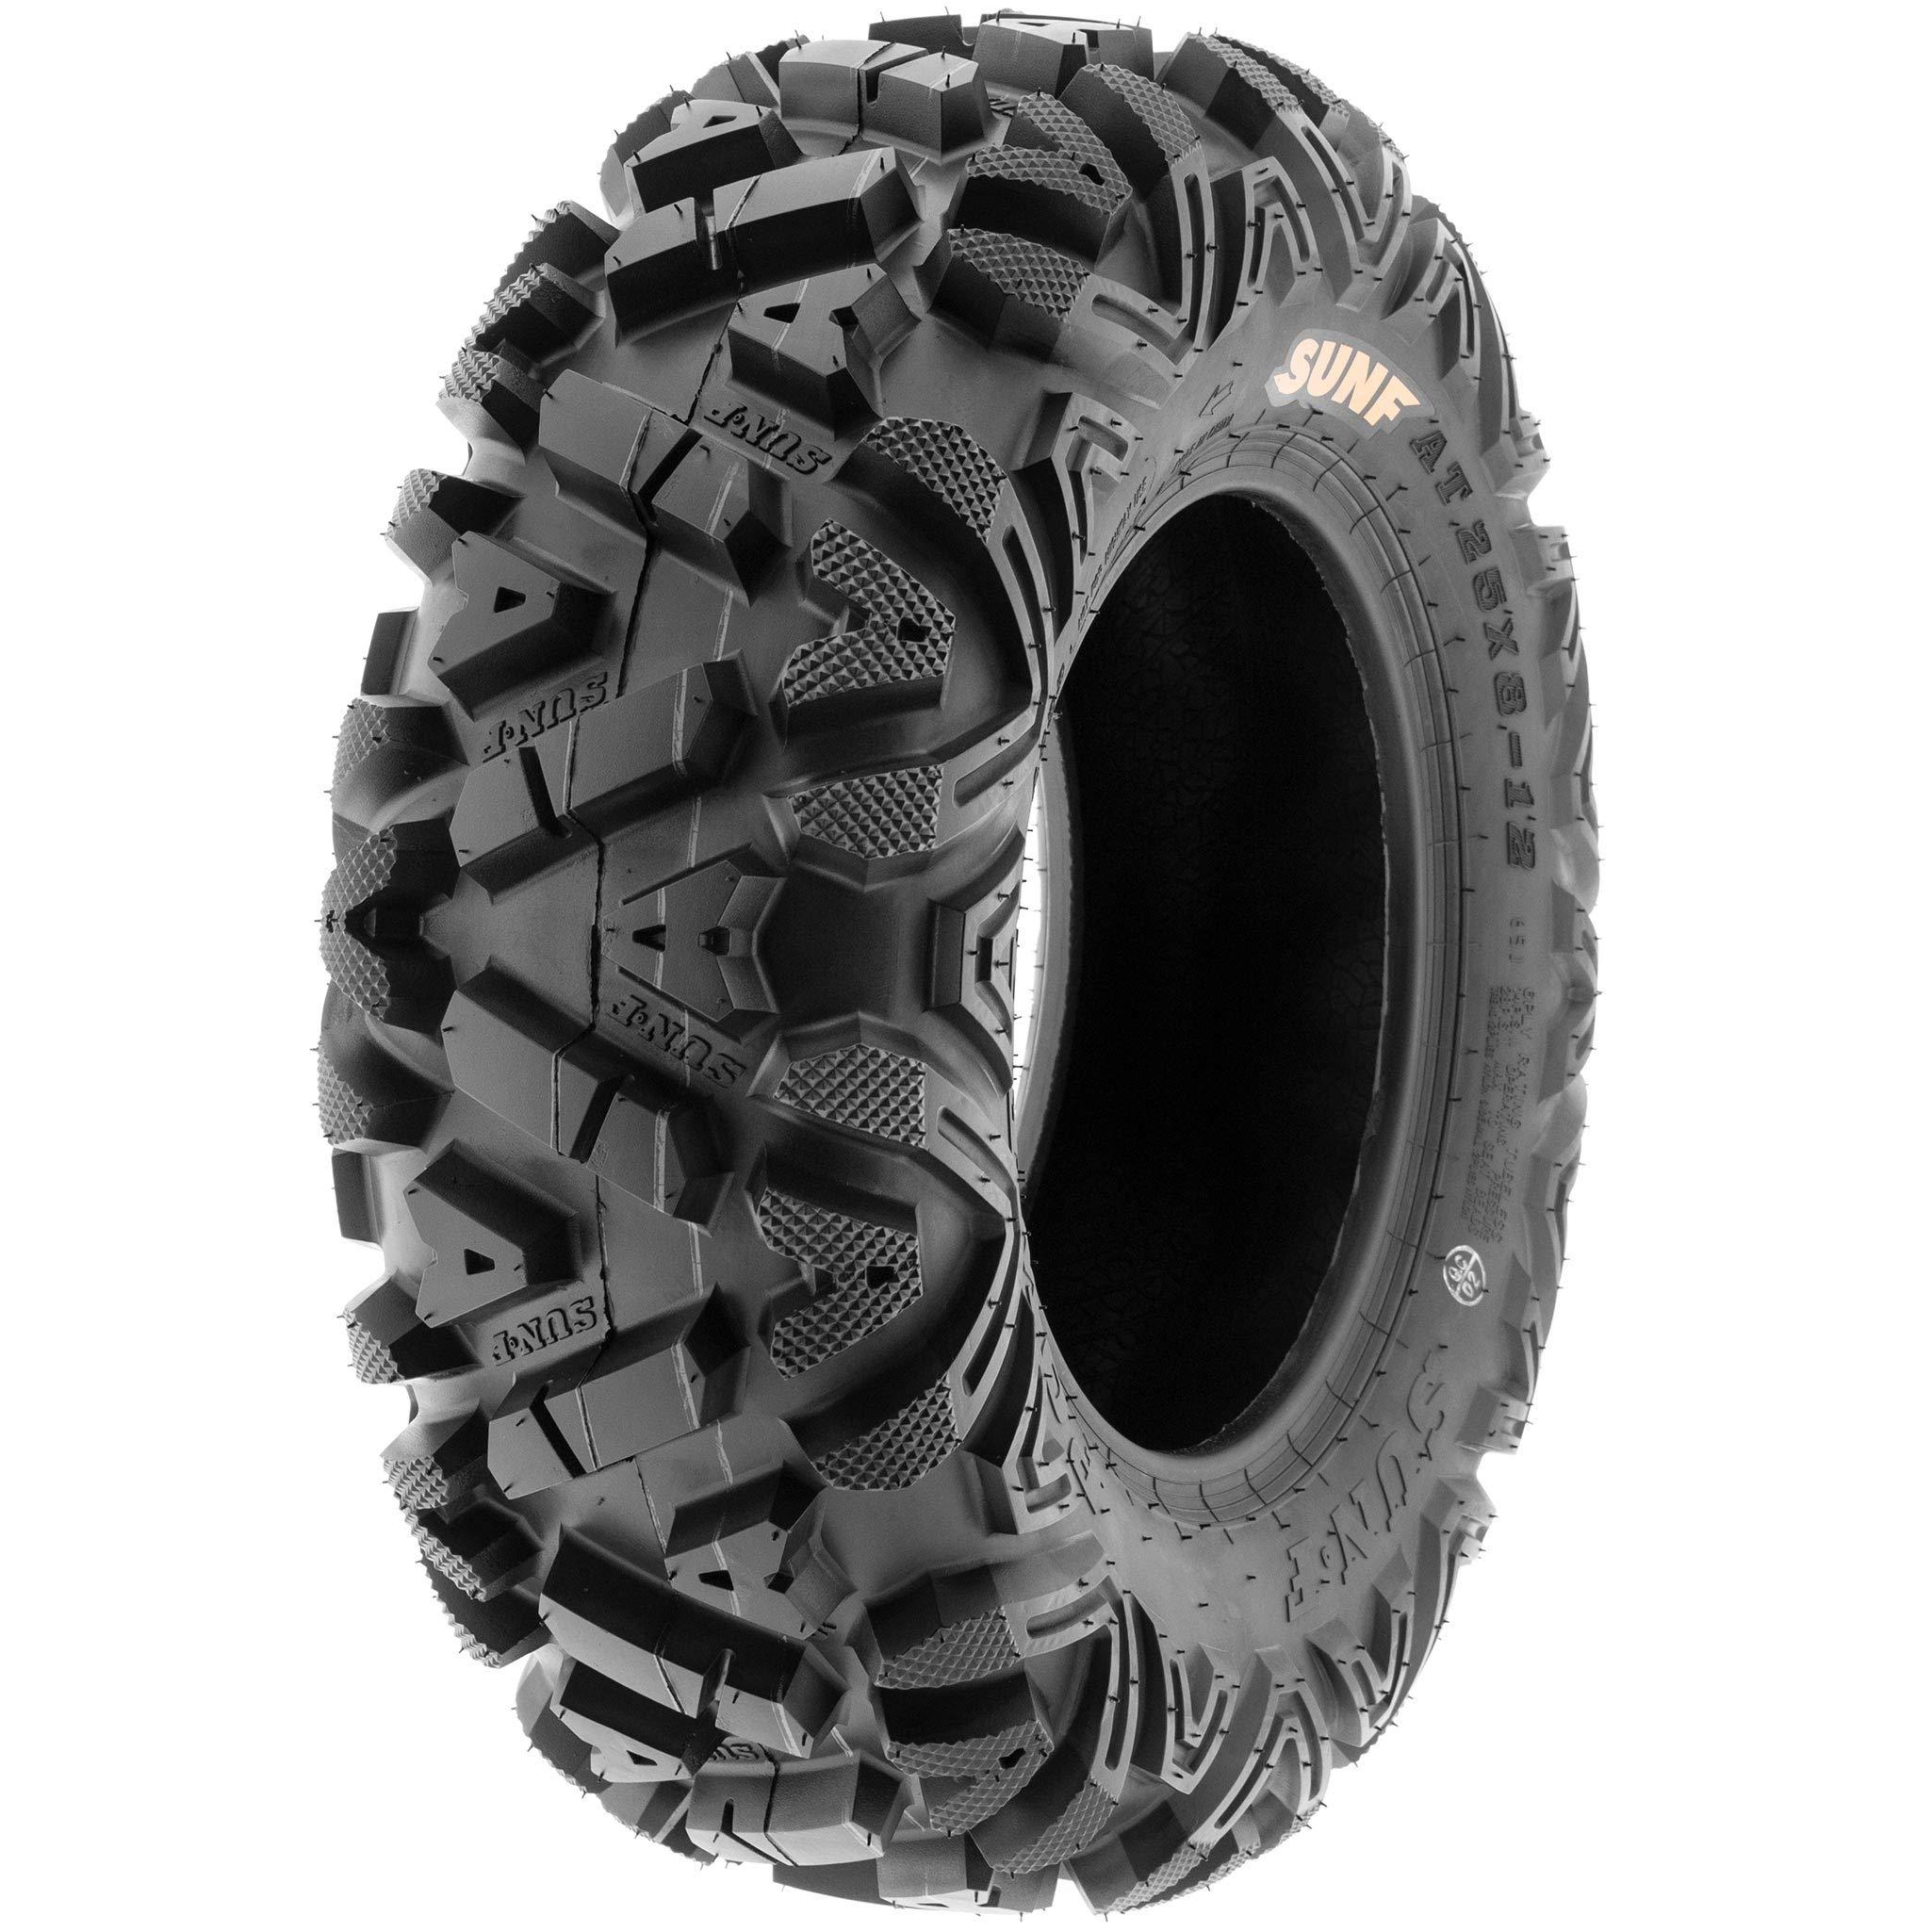 Set of 4 SunF Power.I ATV/UTV AT all-terrain Tires 24x8-11 Front & 24x11-10 Rear, 6 PR, Tubeless A033 by SUNF (Image #6)